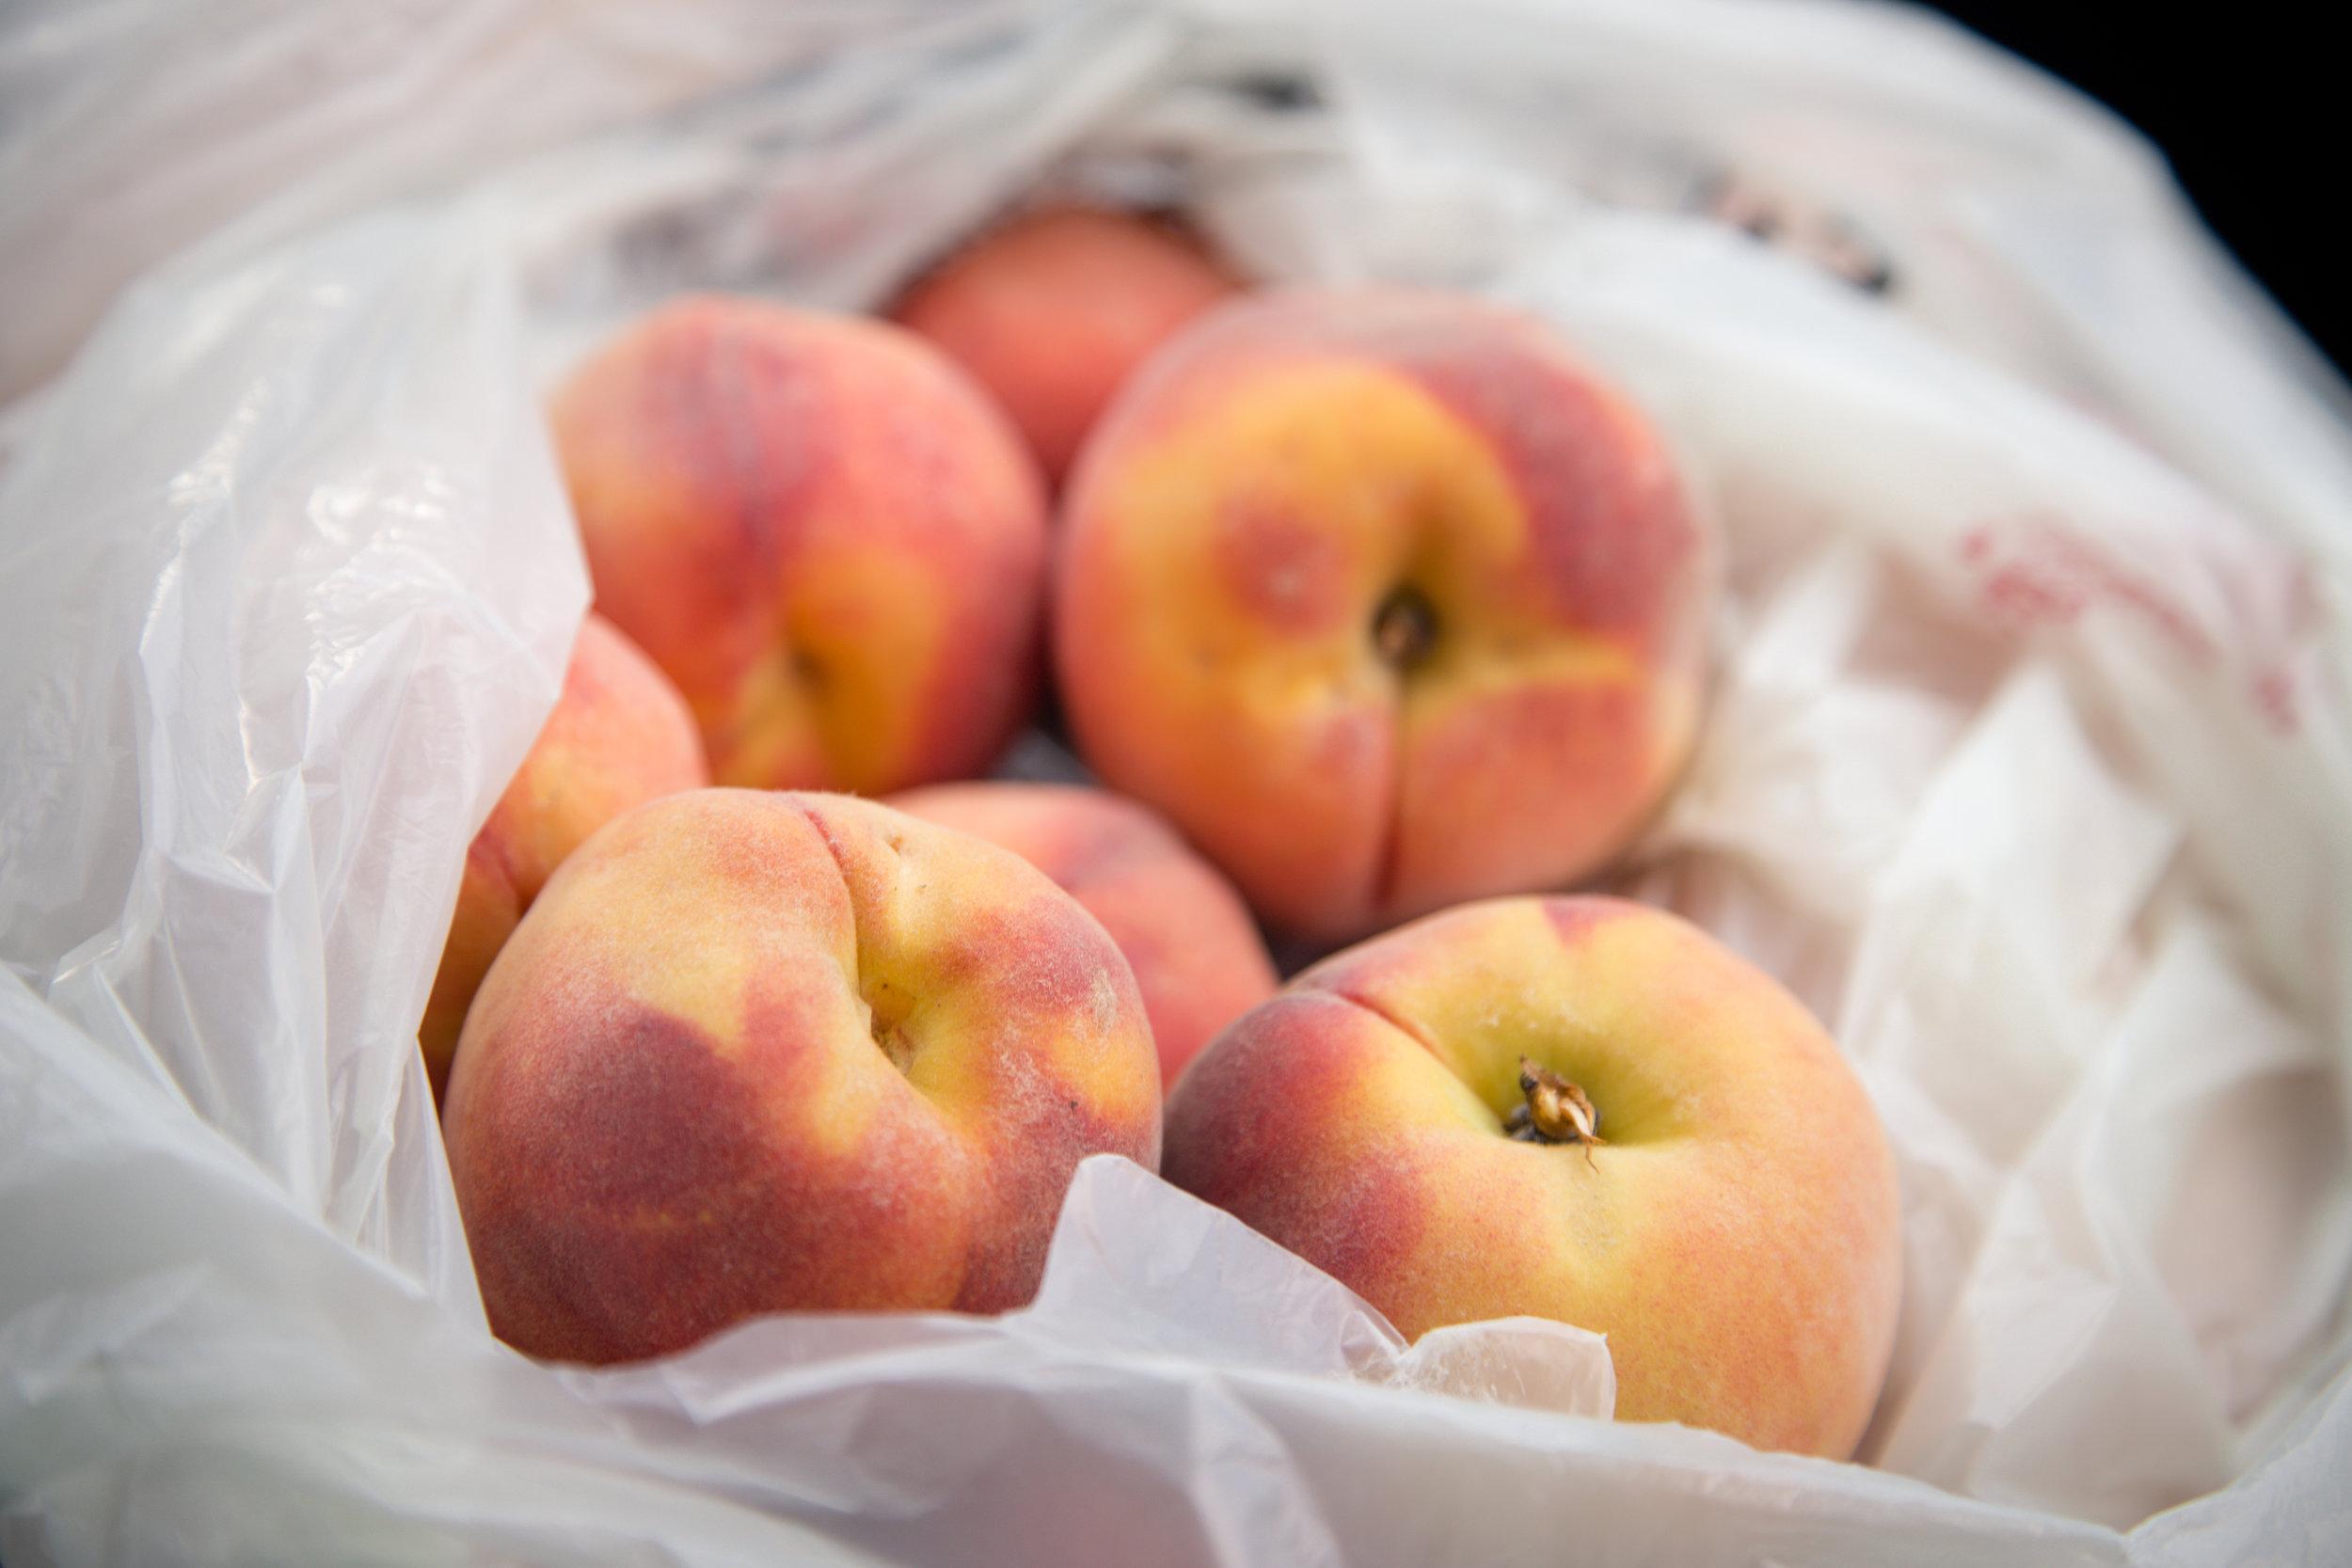 216 // 366 Fresh Belleville peaches!